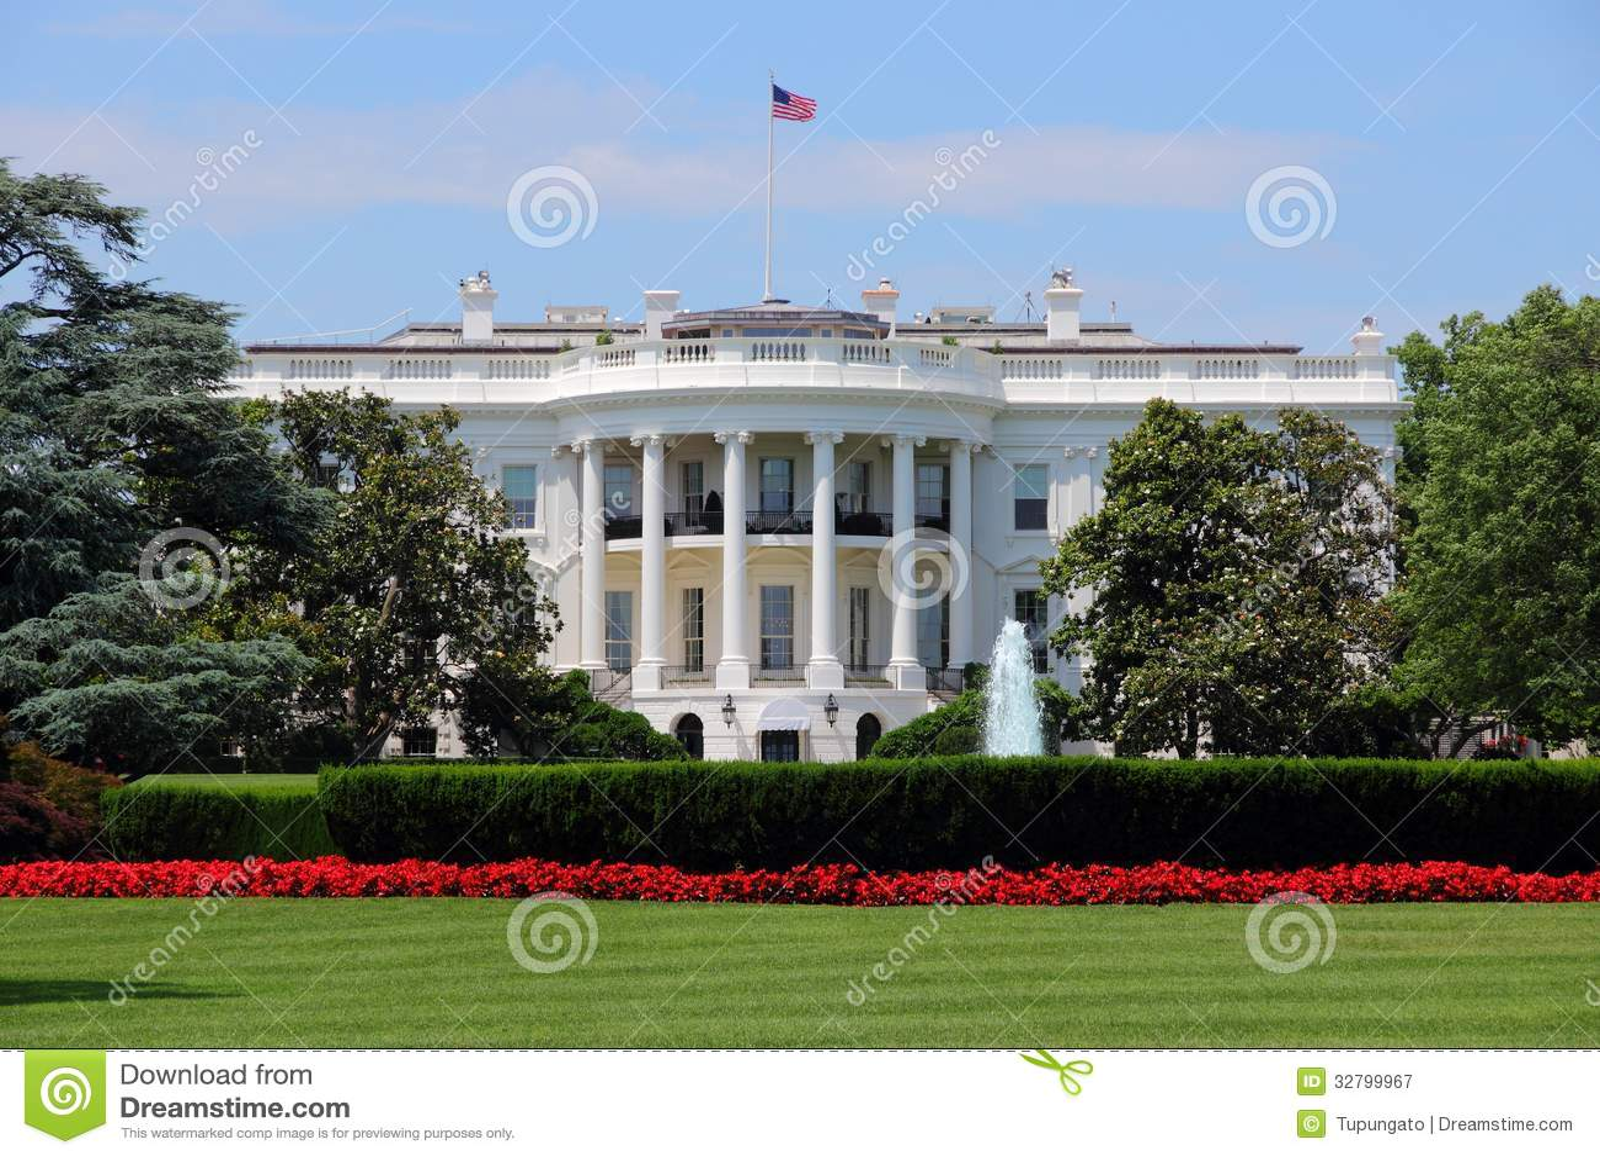 White House (TN) United States  city photos : The White House In Washington Dc United States Stock Photo | Black ...